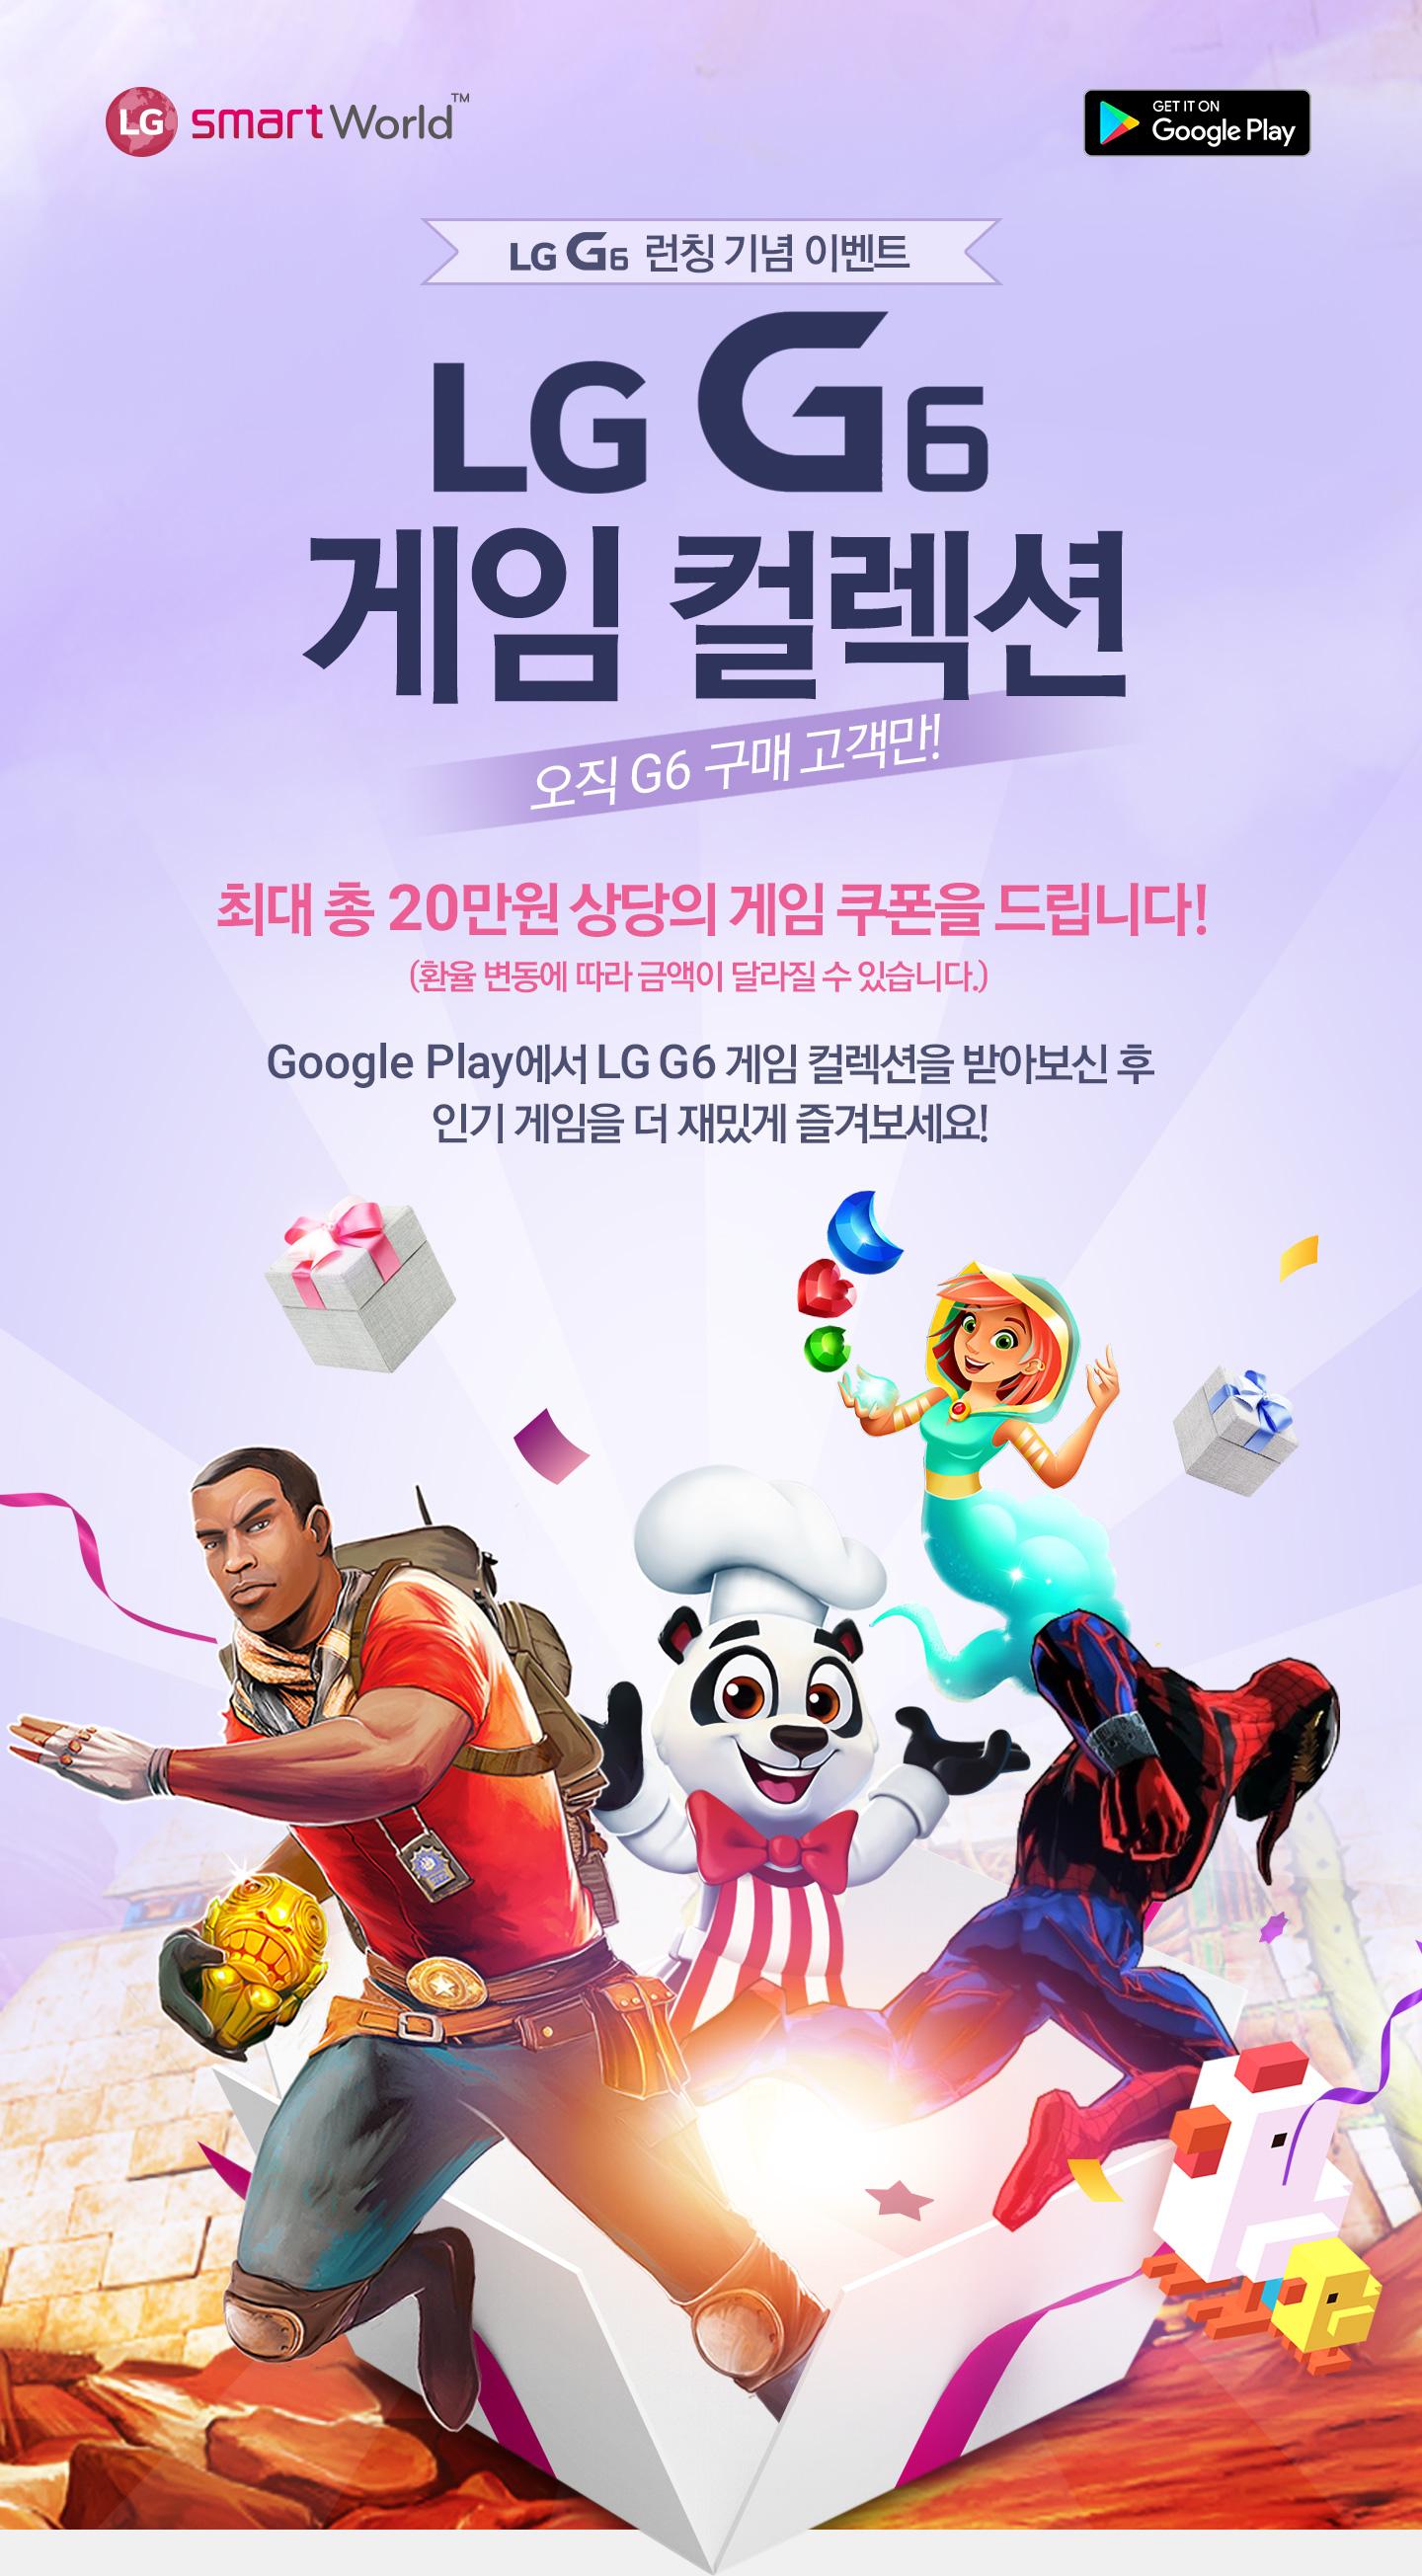 LG G6 런칭 기념 이벤트